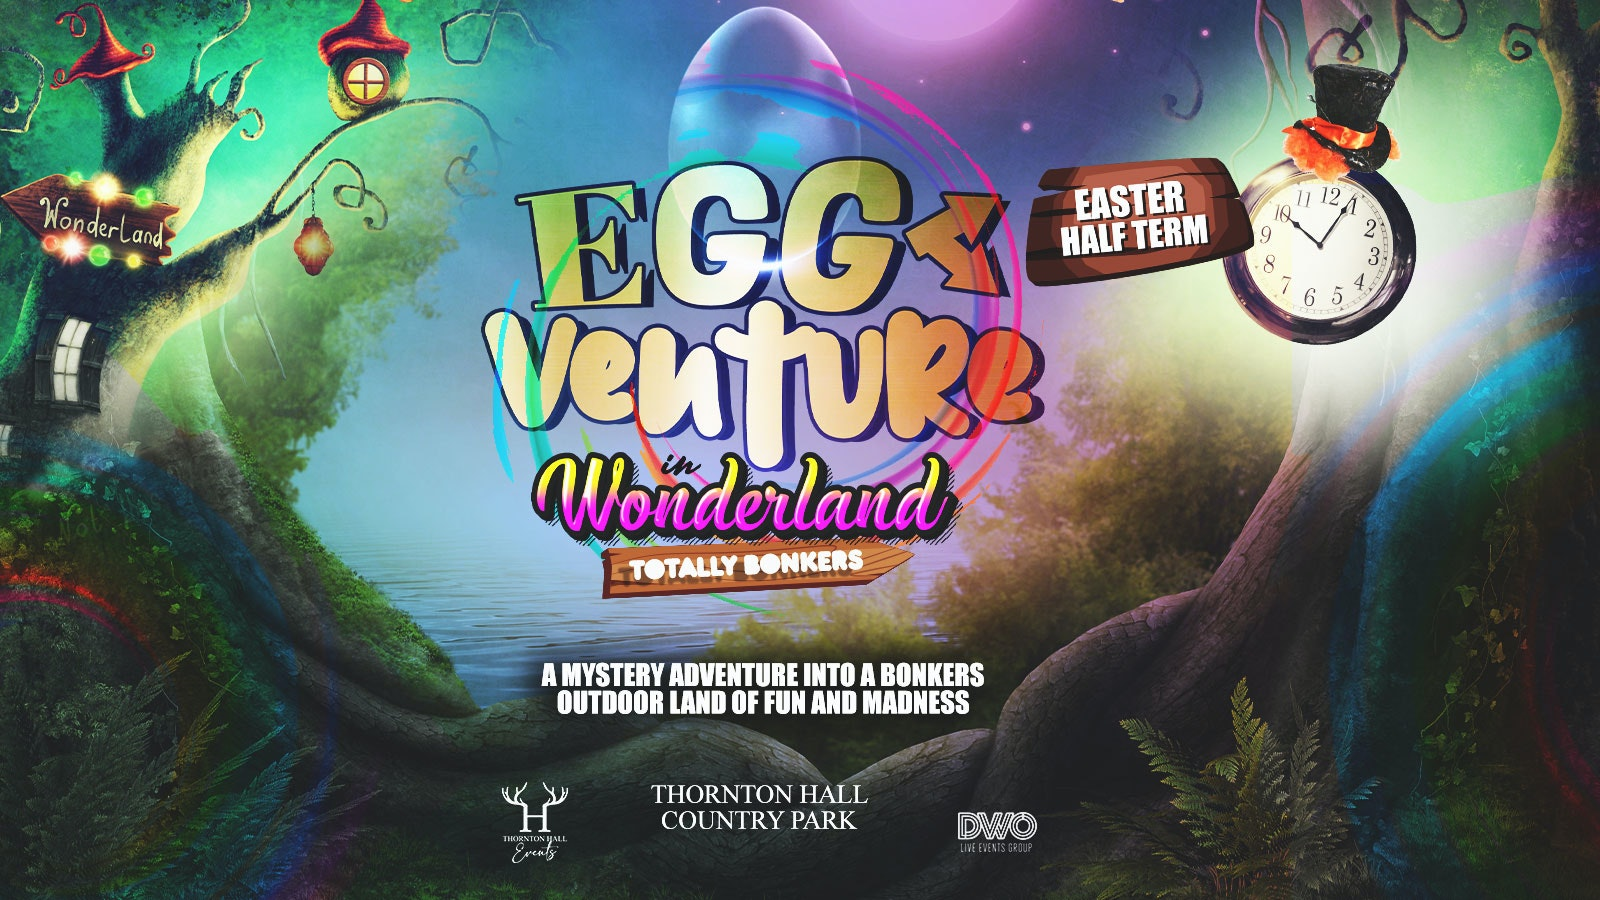 EggVenture in Wonderland – Saturday 10th April – 12noon